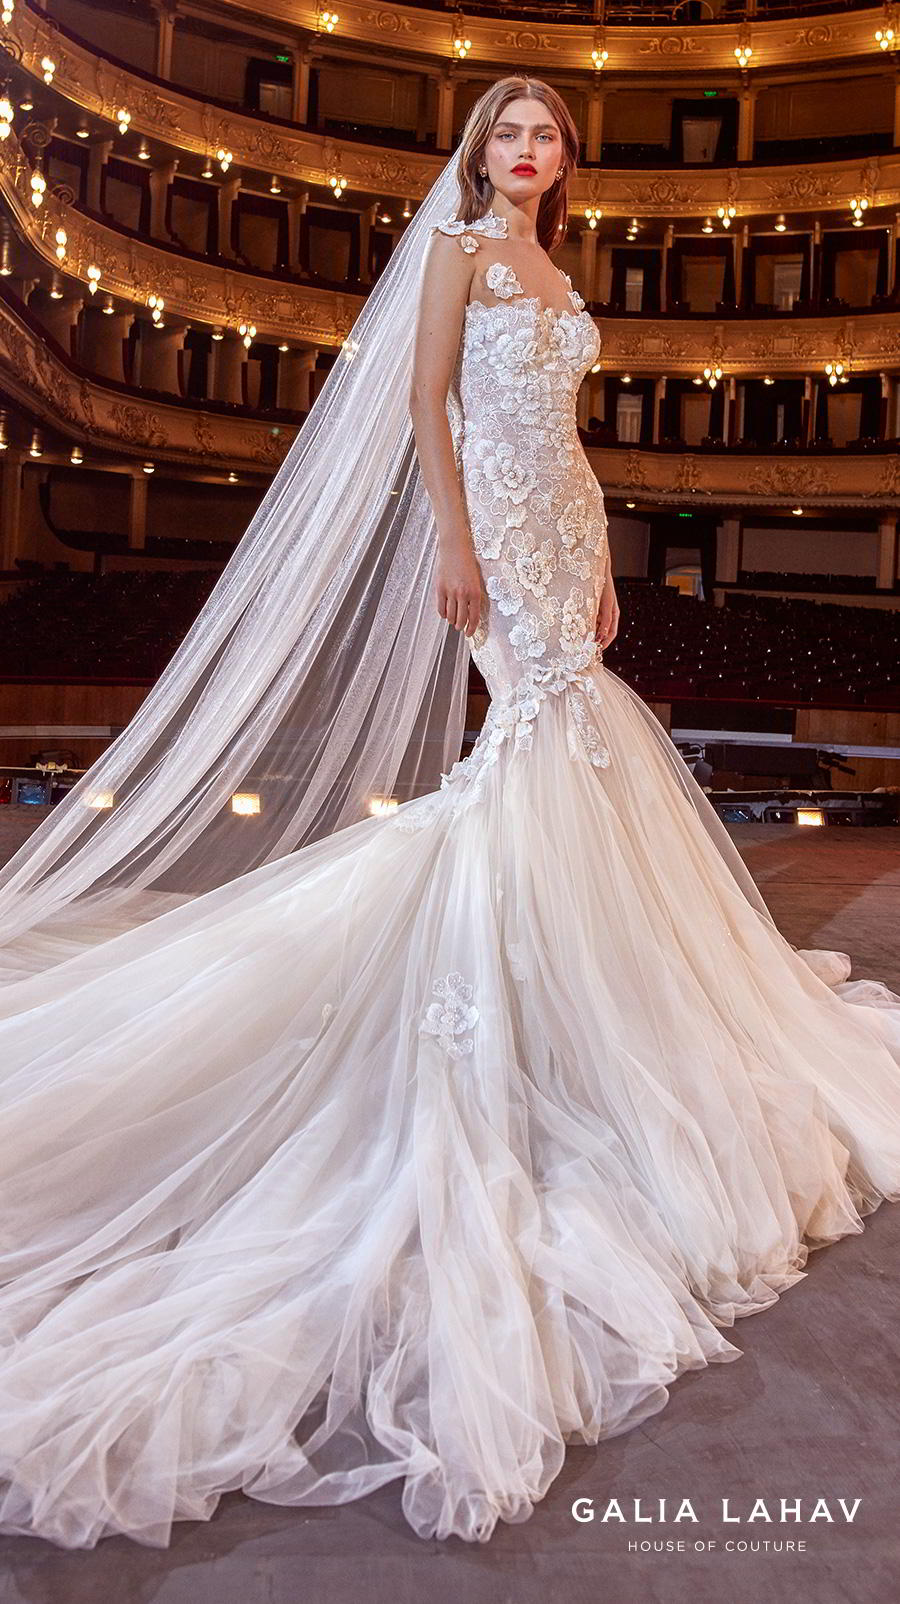 galia lahav s2020 couture bridal cap sleeves illusion jewel sweetheart neckline heavily embellished bodice romantic mermaid wedding dress keyhole low back royal train (michelle) sdv